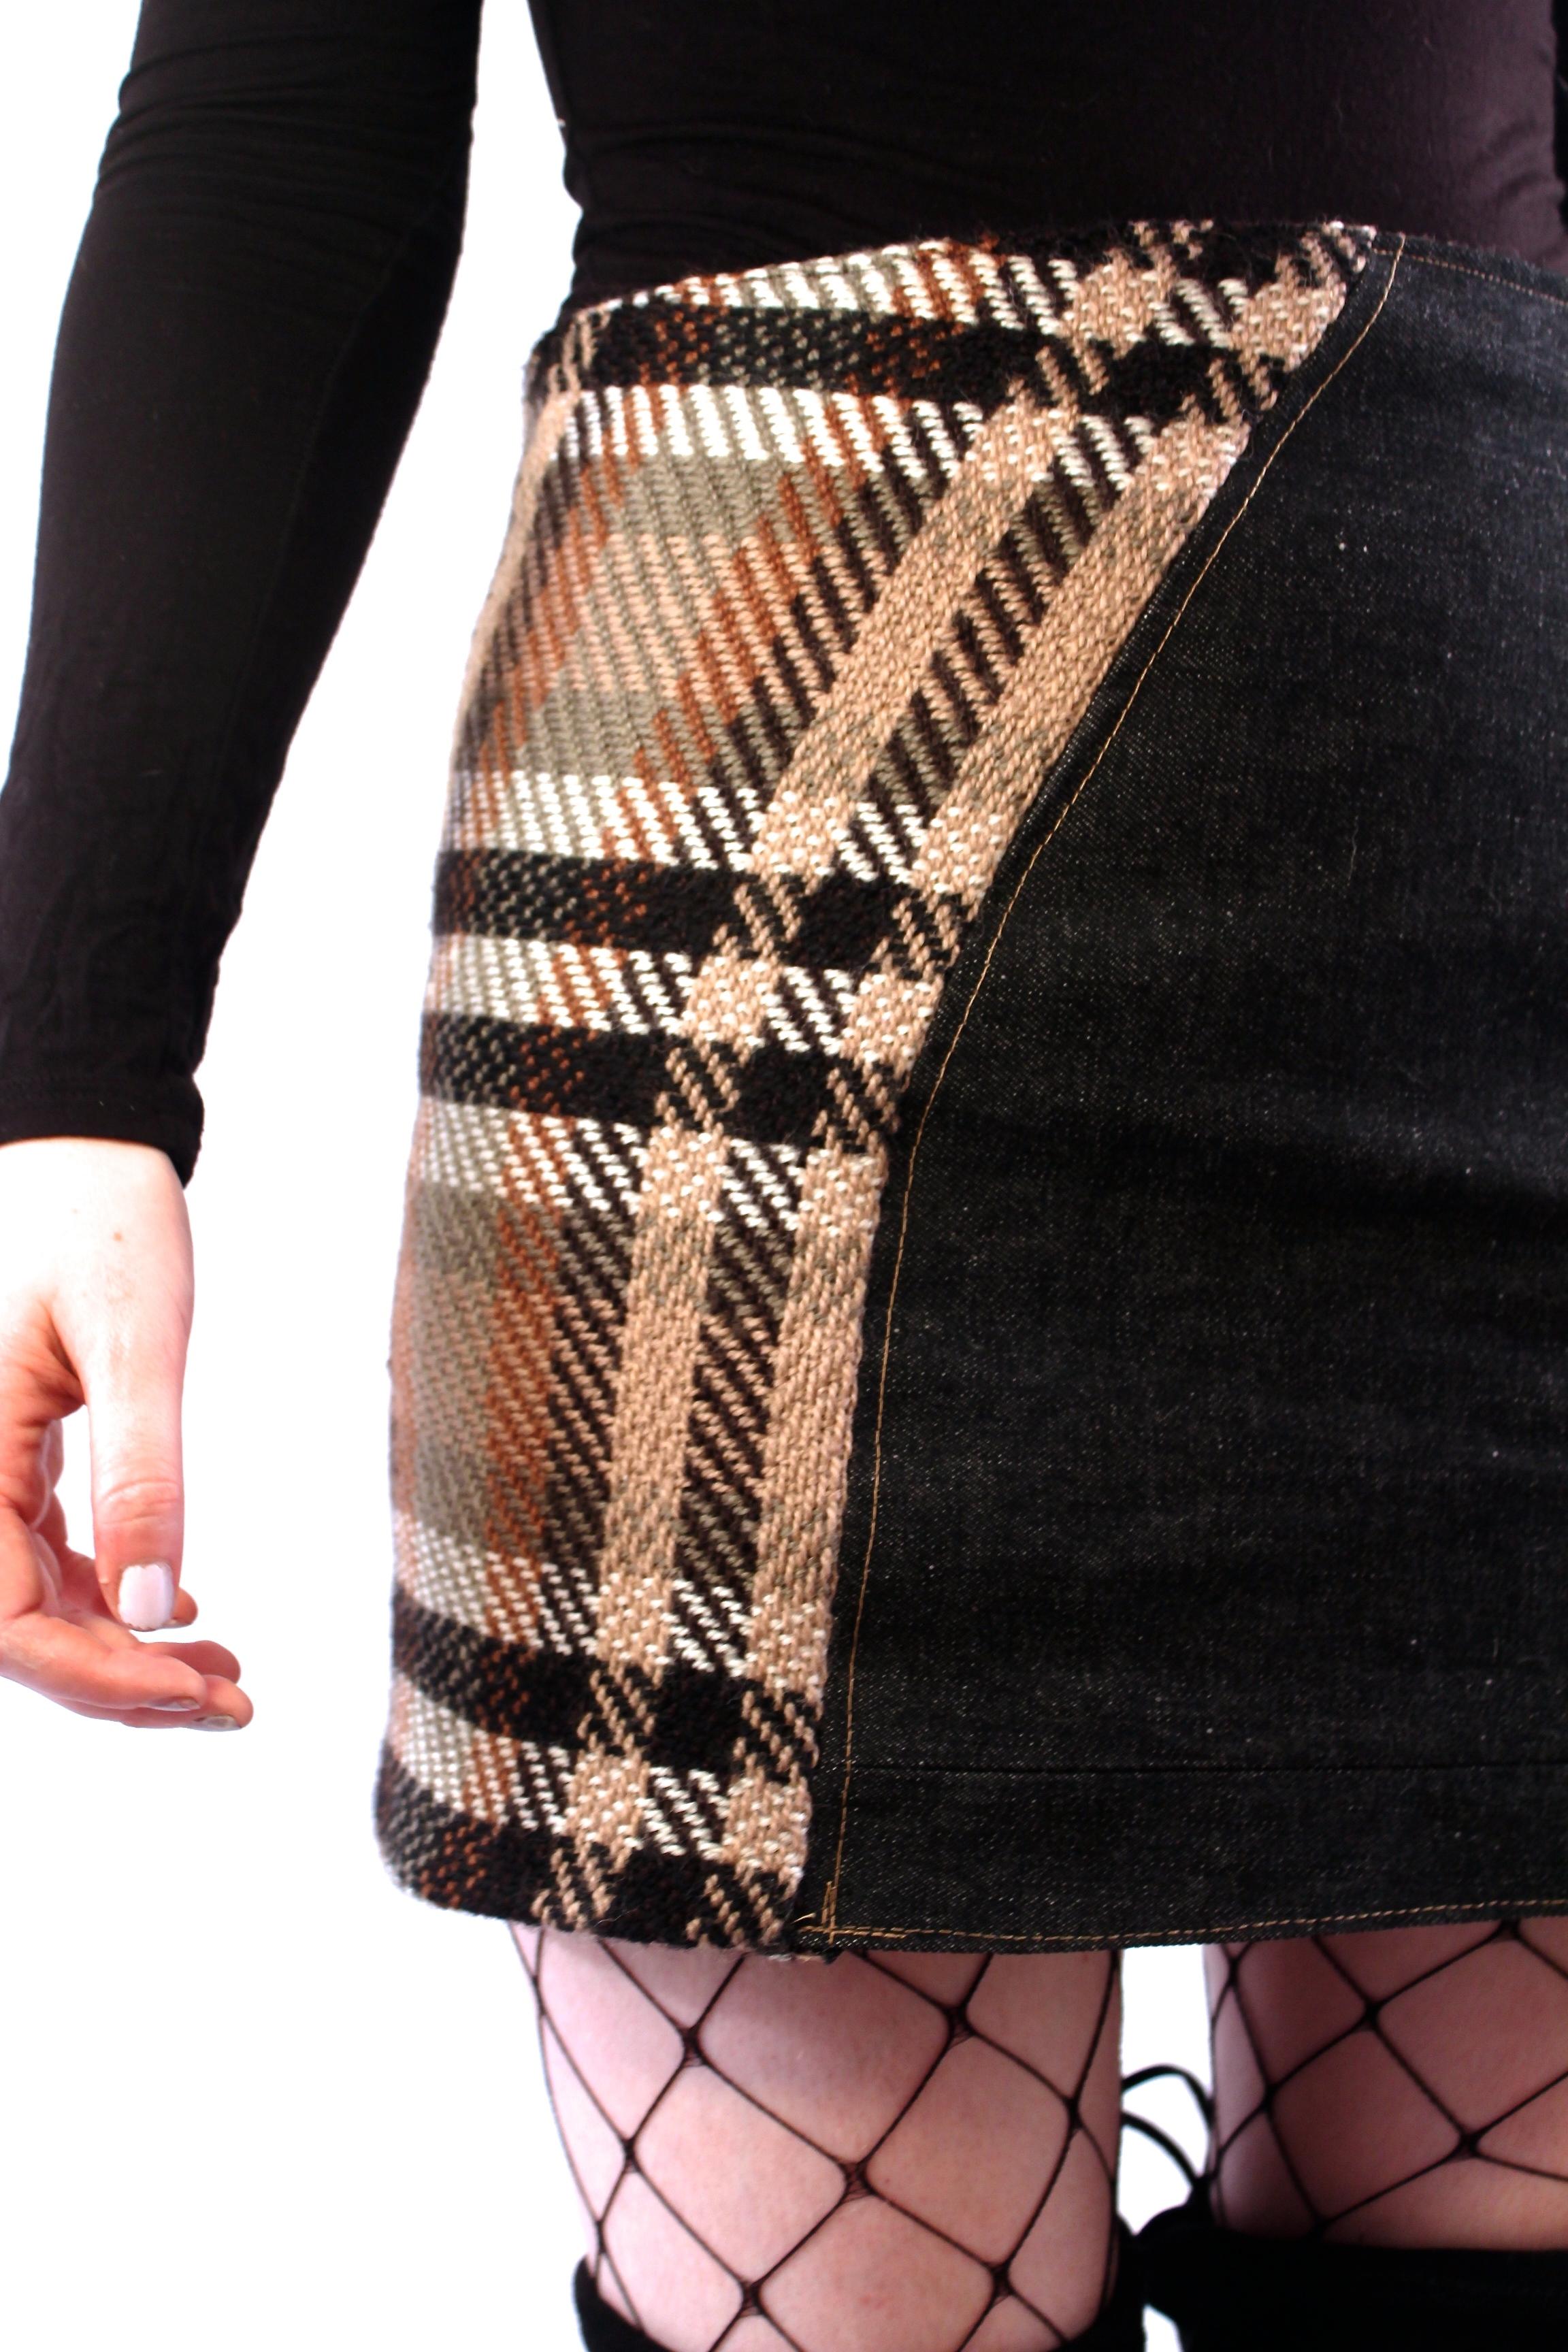 Skirt by Jose Holguin